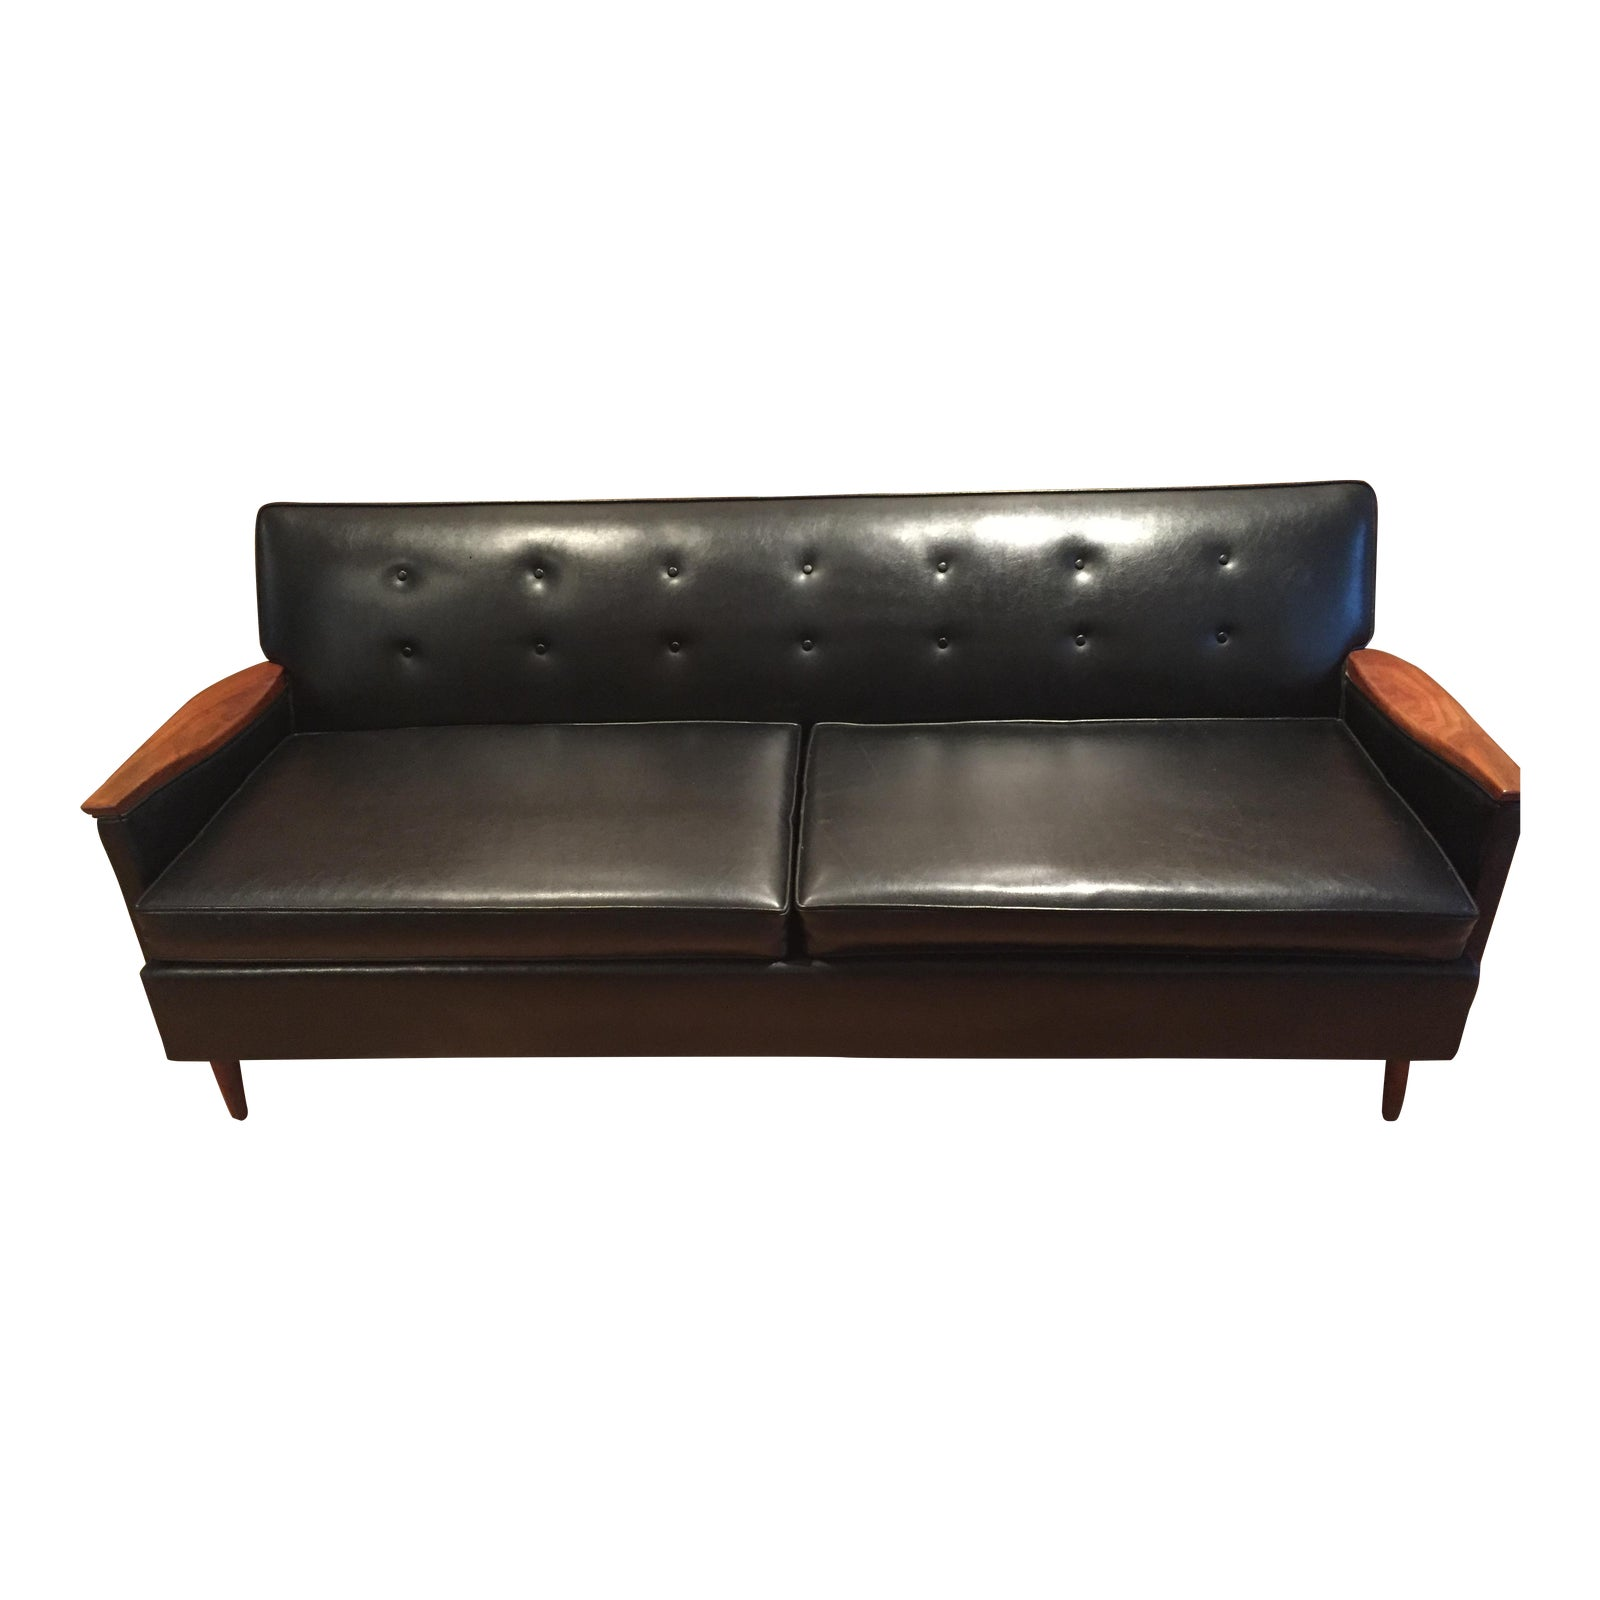 Enjoyable Mid Century Modern Era By Magnuson Black Sofa Machost Co Dining Chair Design Ideas Machostcouk